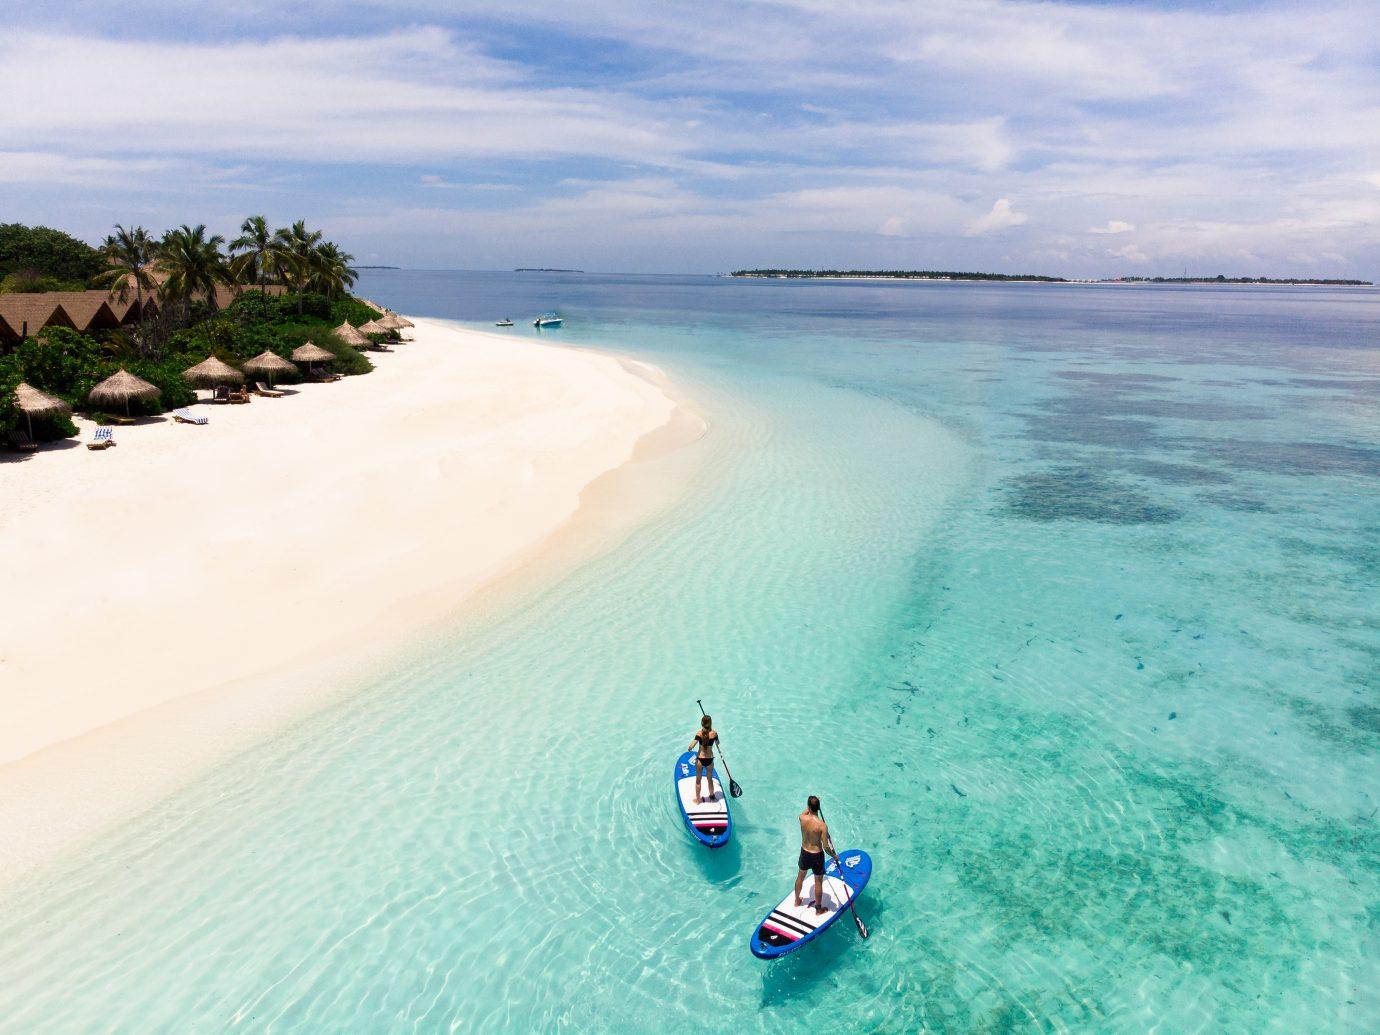 paddle boarders in the water at Reethi Faru Resort, Raa Atoll, Maldives